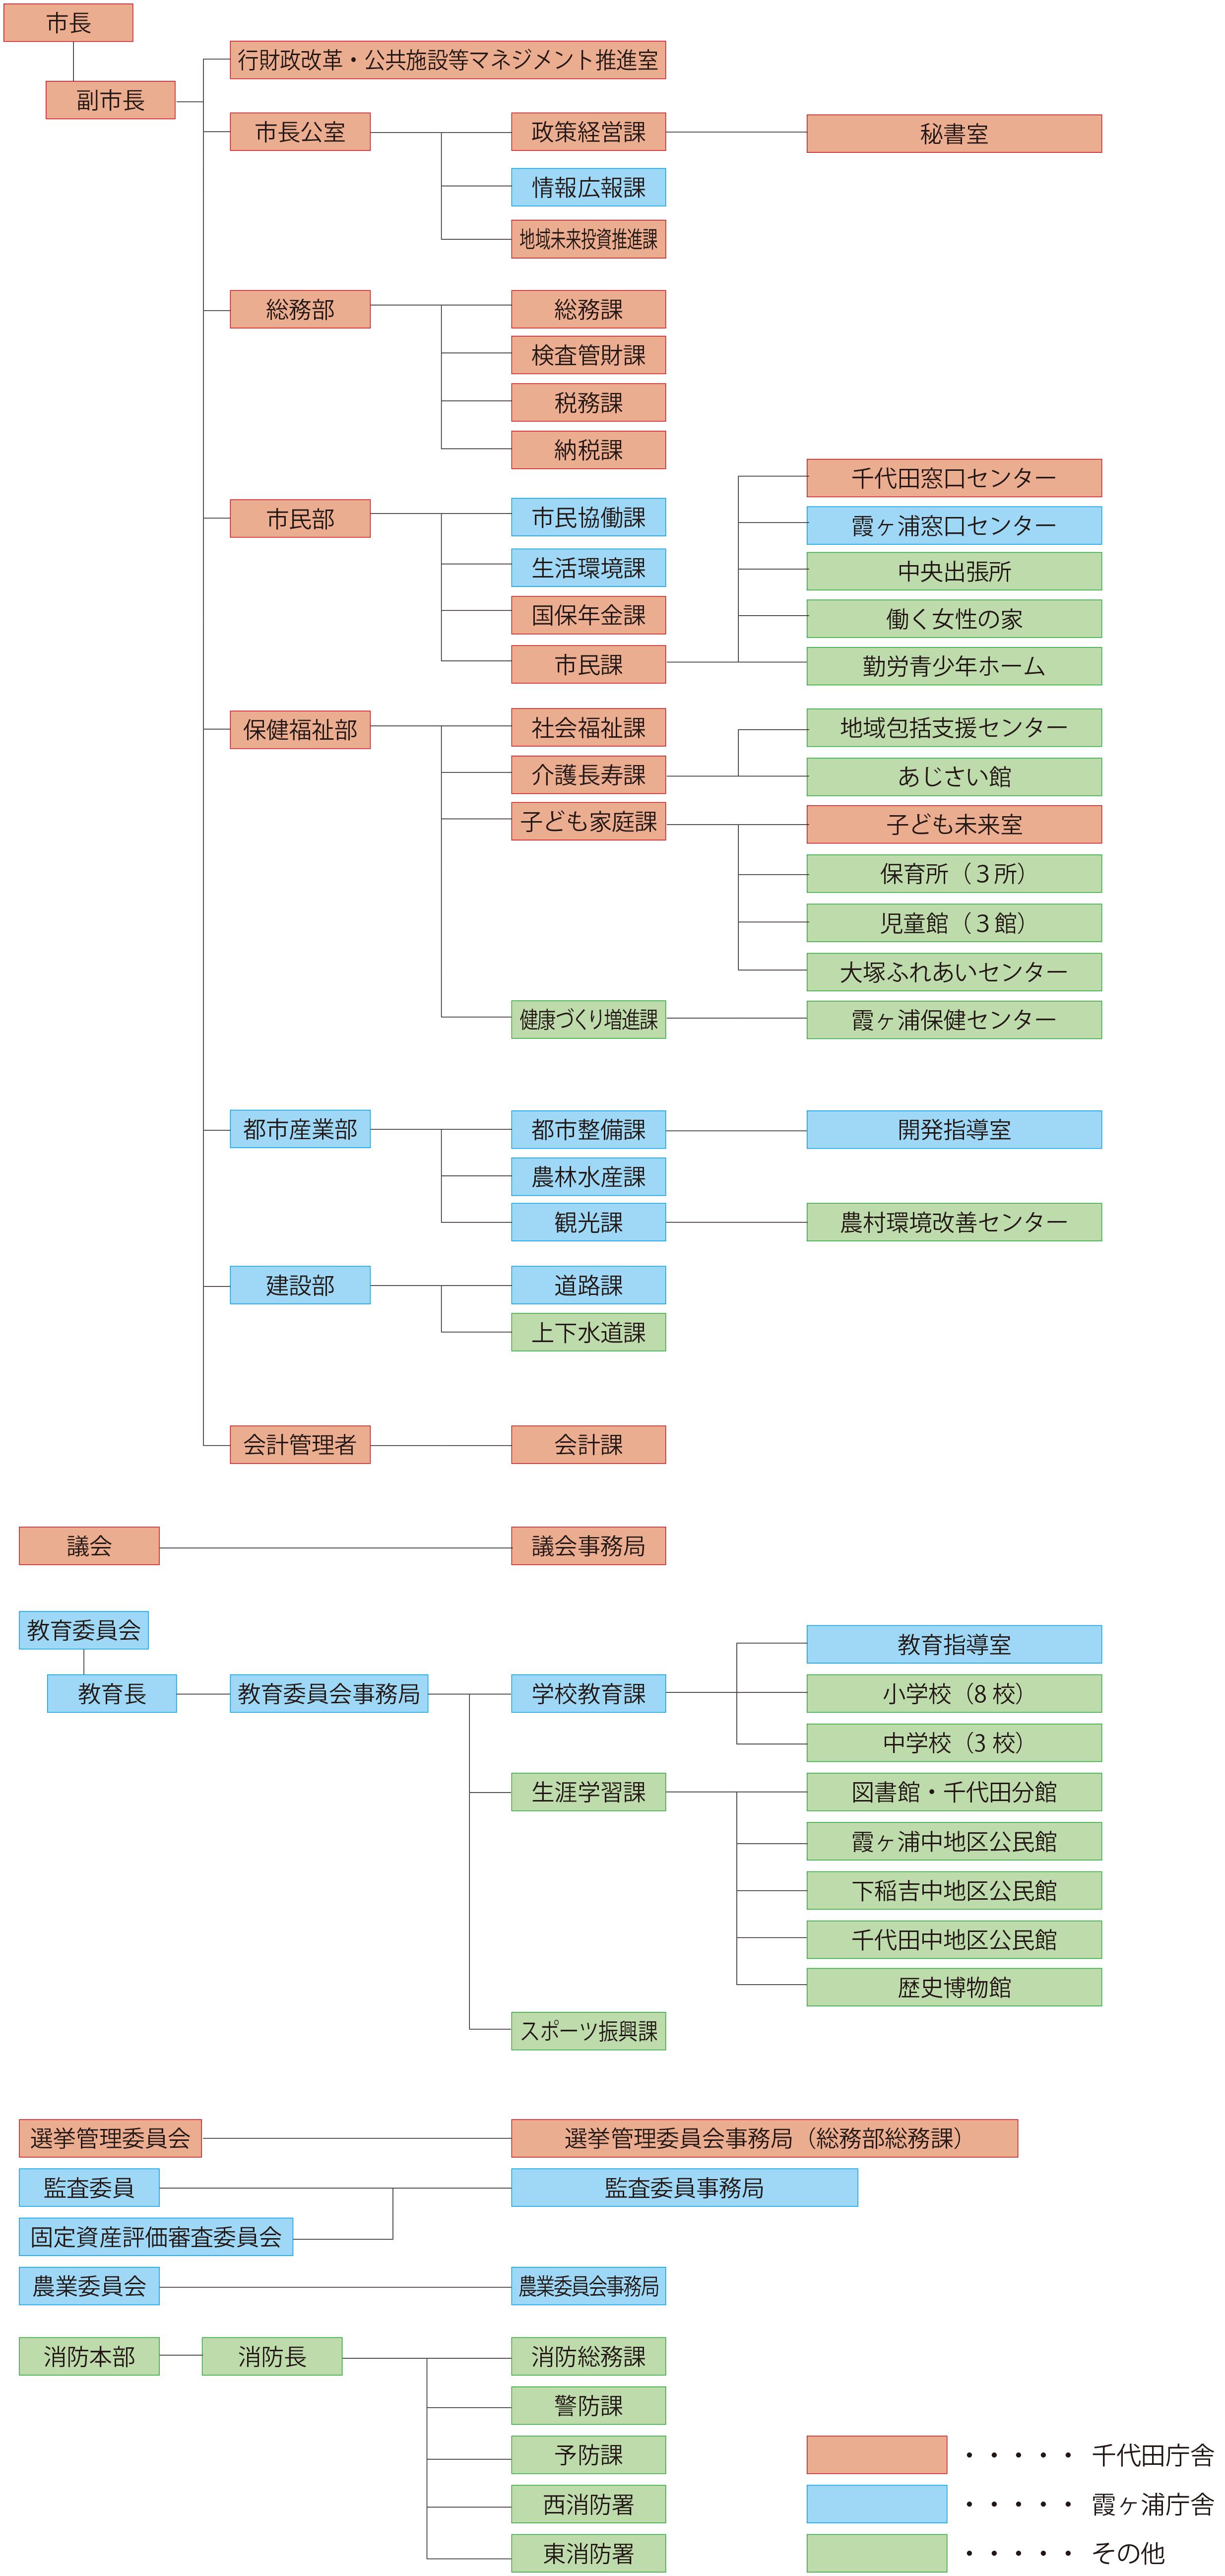 令和2年度組織・機構図